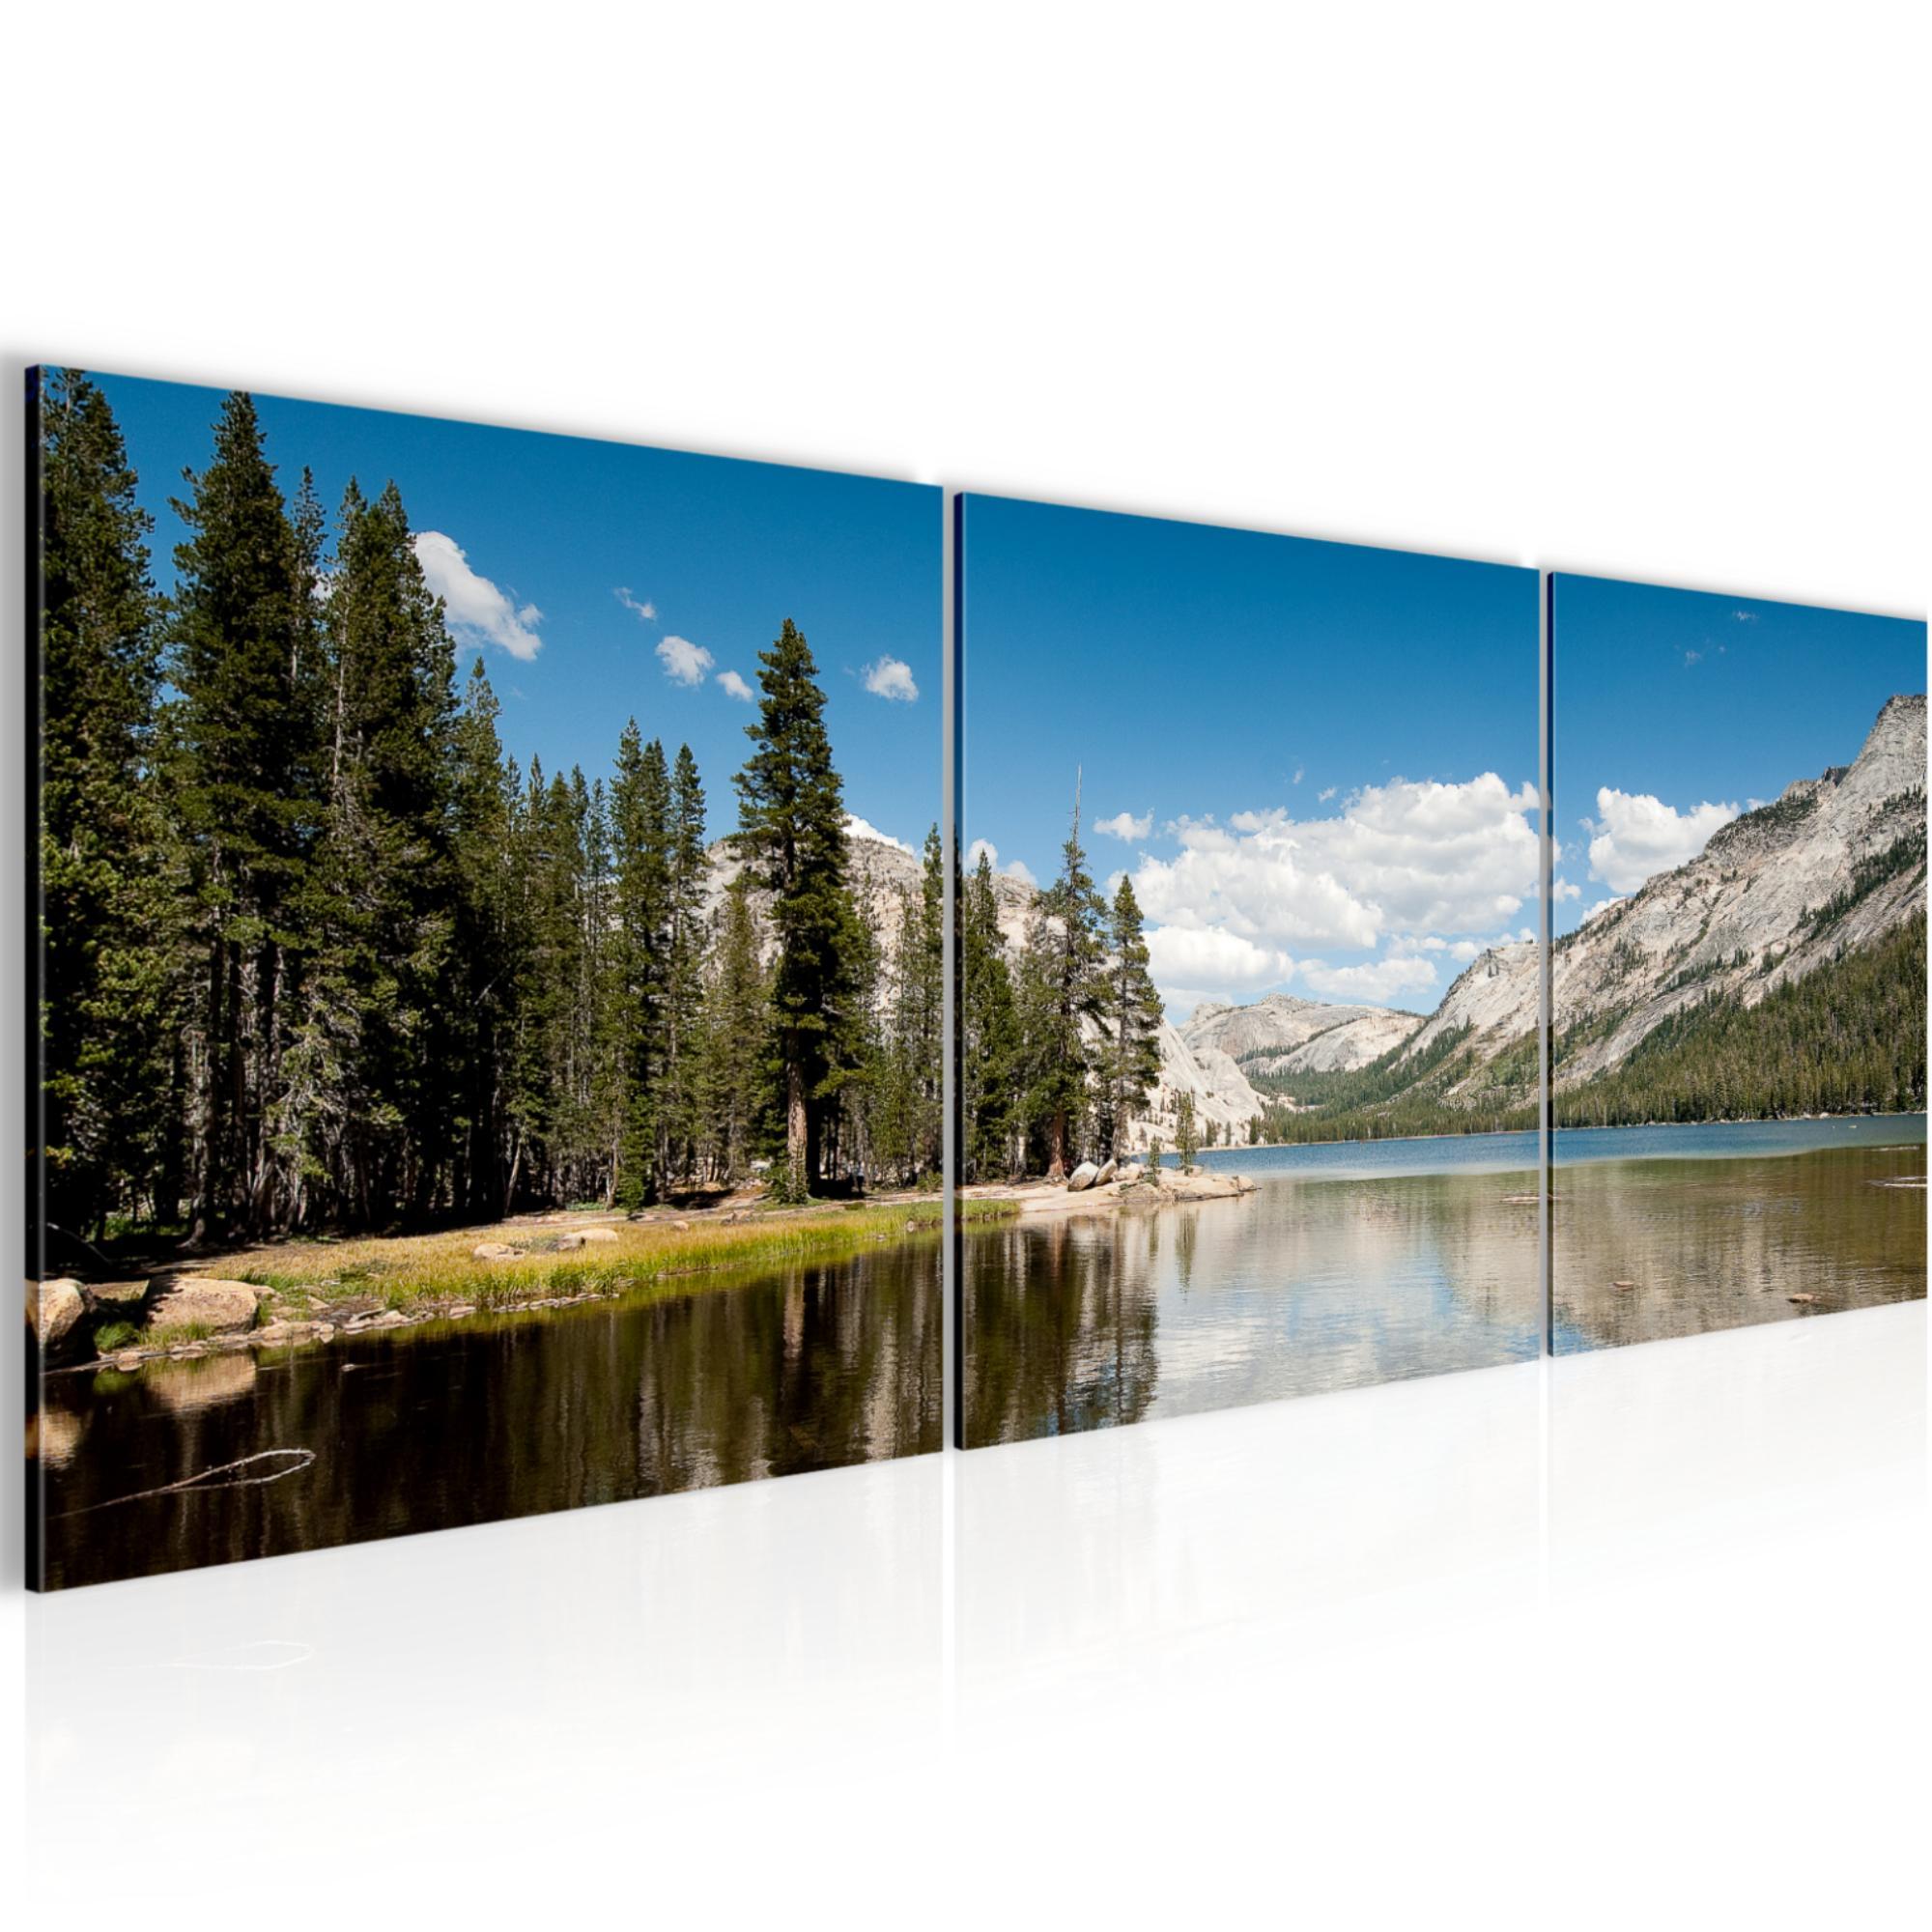 Kunstdruck Leinwand aus Vlies Deko Bild Bilder Wandbild XXL Berg Landschaft